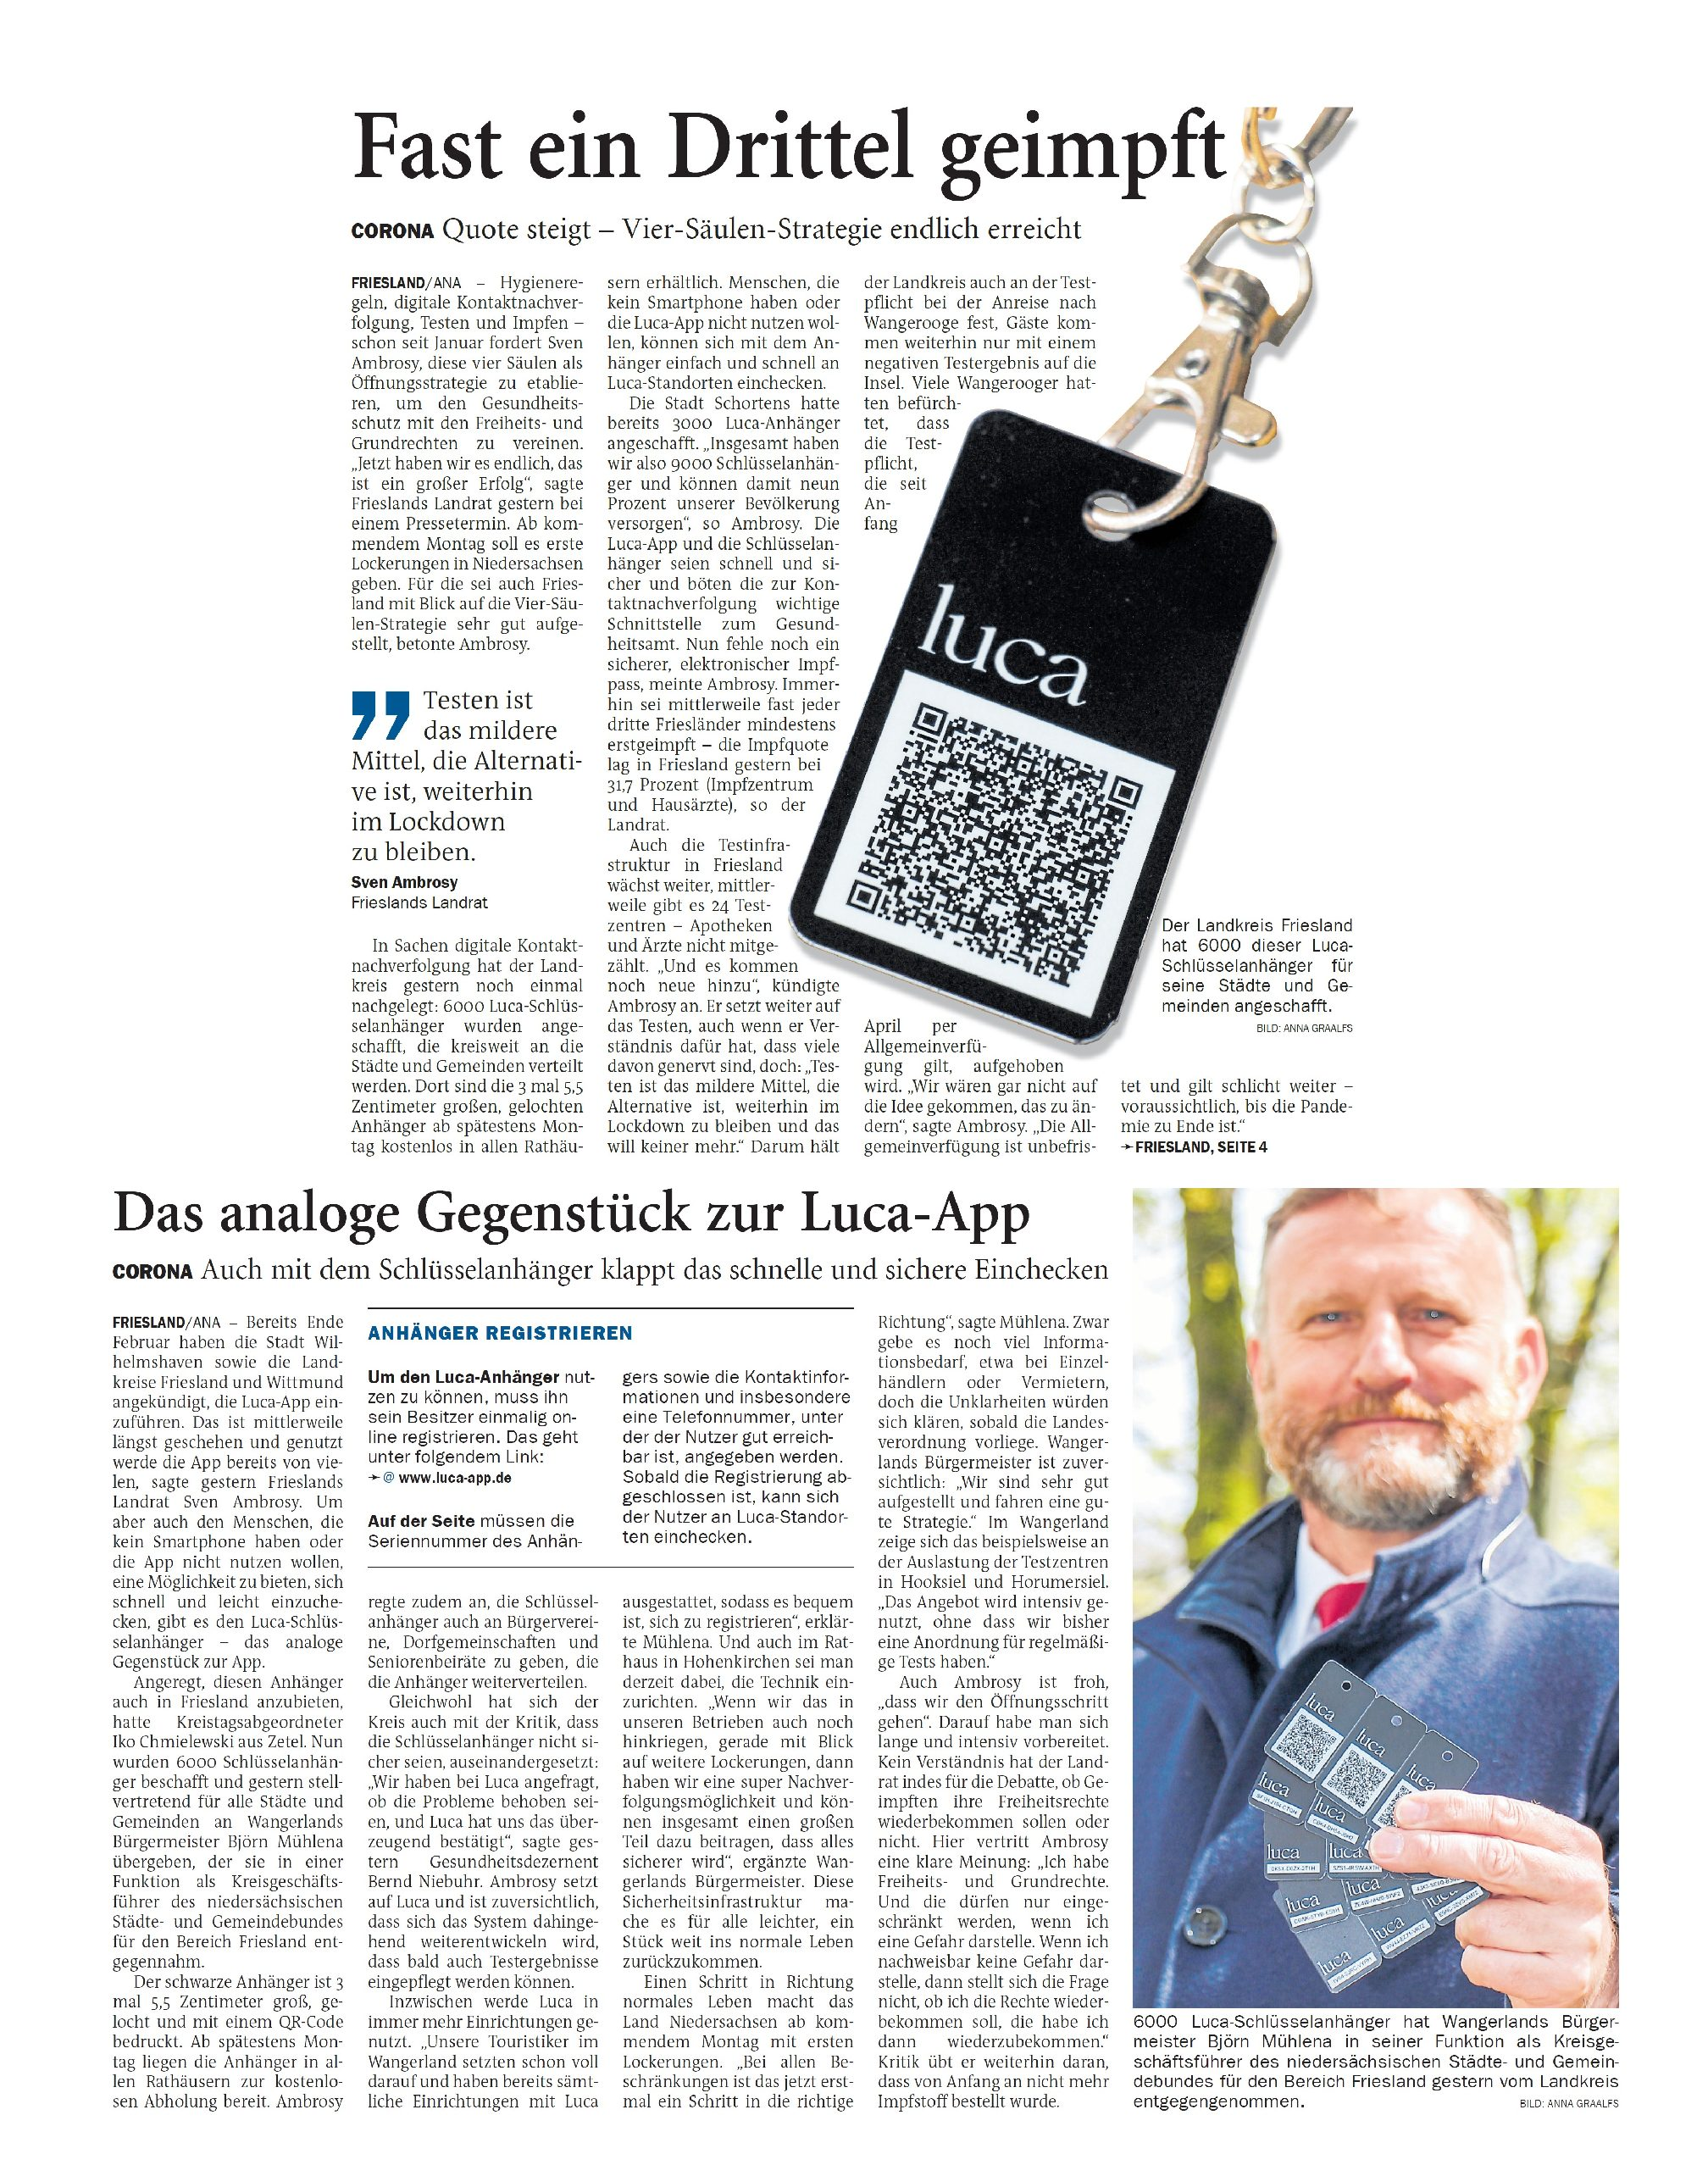 Jeversches Wochenblatt 07.05.2021 III